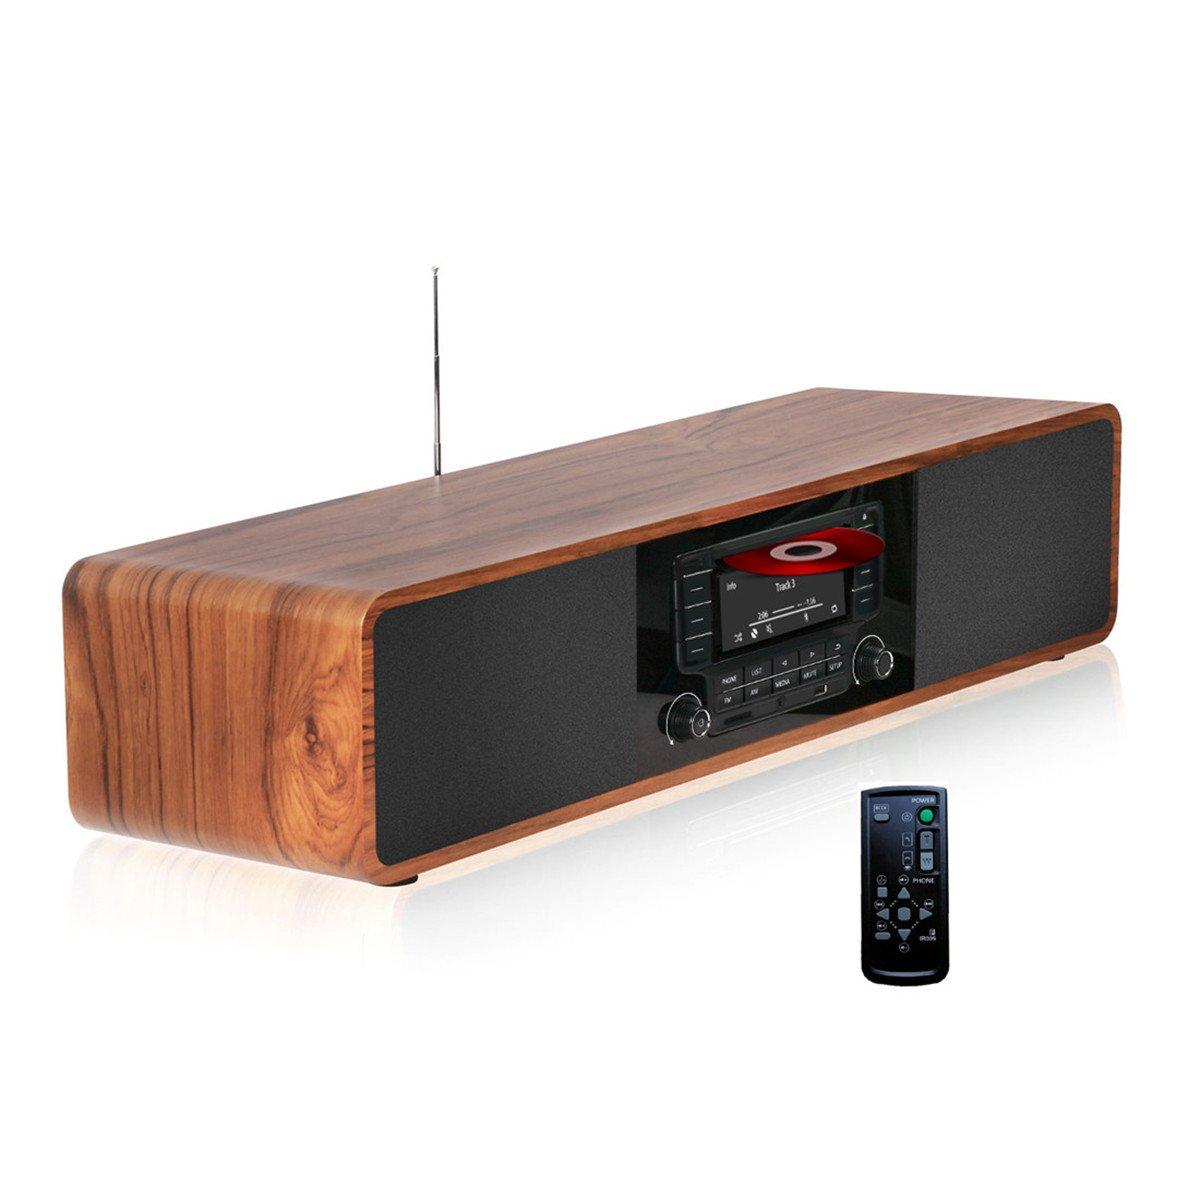 KEiiD Compact CD/MP3 Player Stereo Wooden Desktop Bluetooth Hi-Fi Speaker Portable Boombox Home Audio Component Music Shelf System with FM Radio Digital Tuner Remote Control USB SD AUX,Soundbar